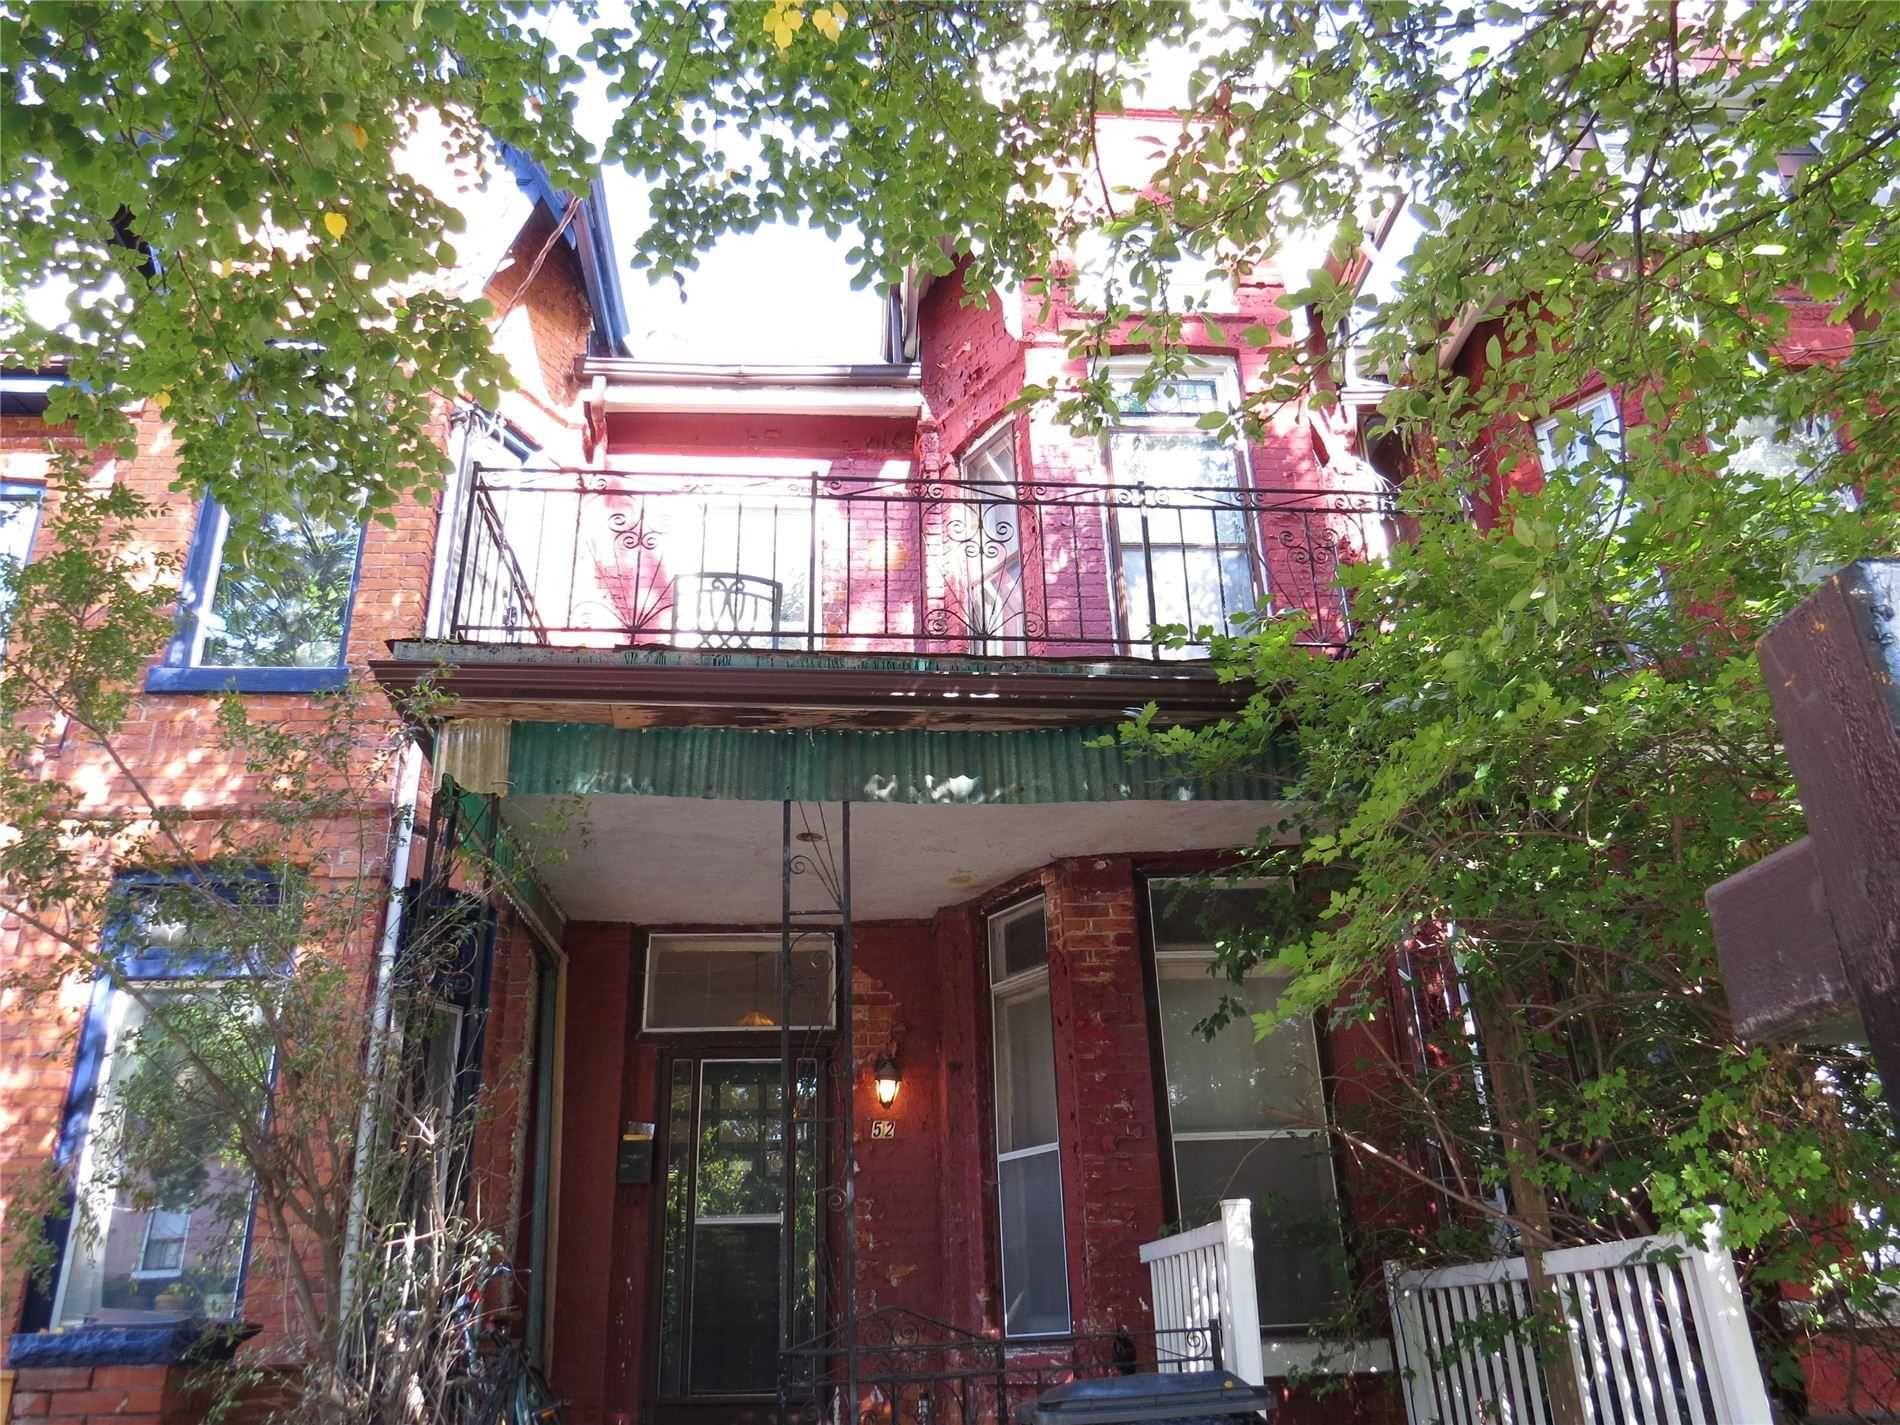 Main Photo: 52 Wales Avenue in Toronto: Kensington-Chinatown House (2 1/2 Storey) for sale (Toronto C01)  : MLS®# C4942139